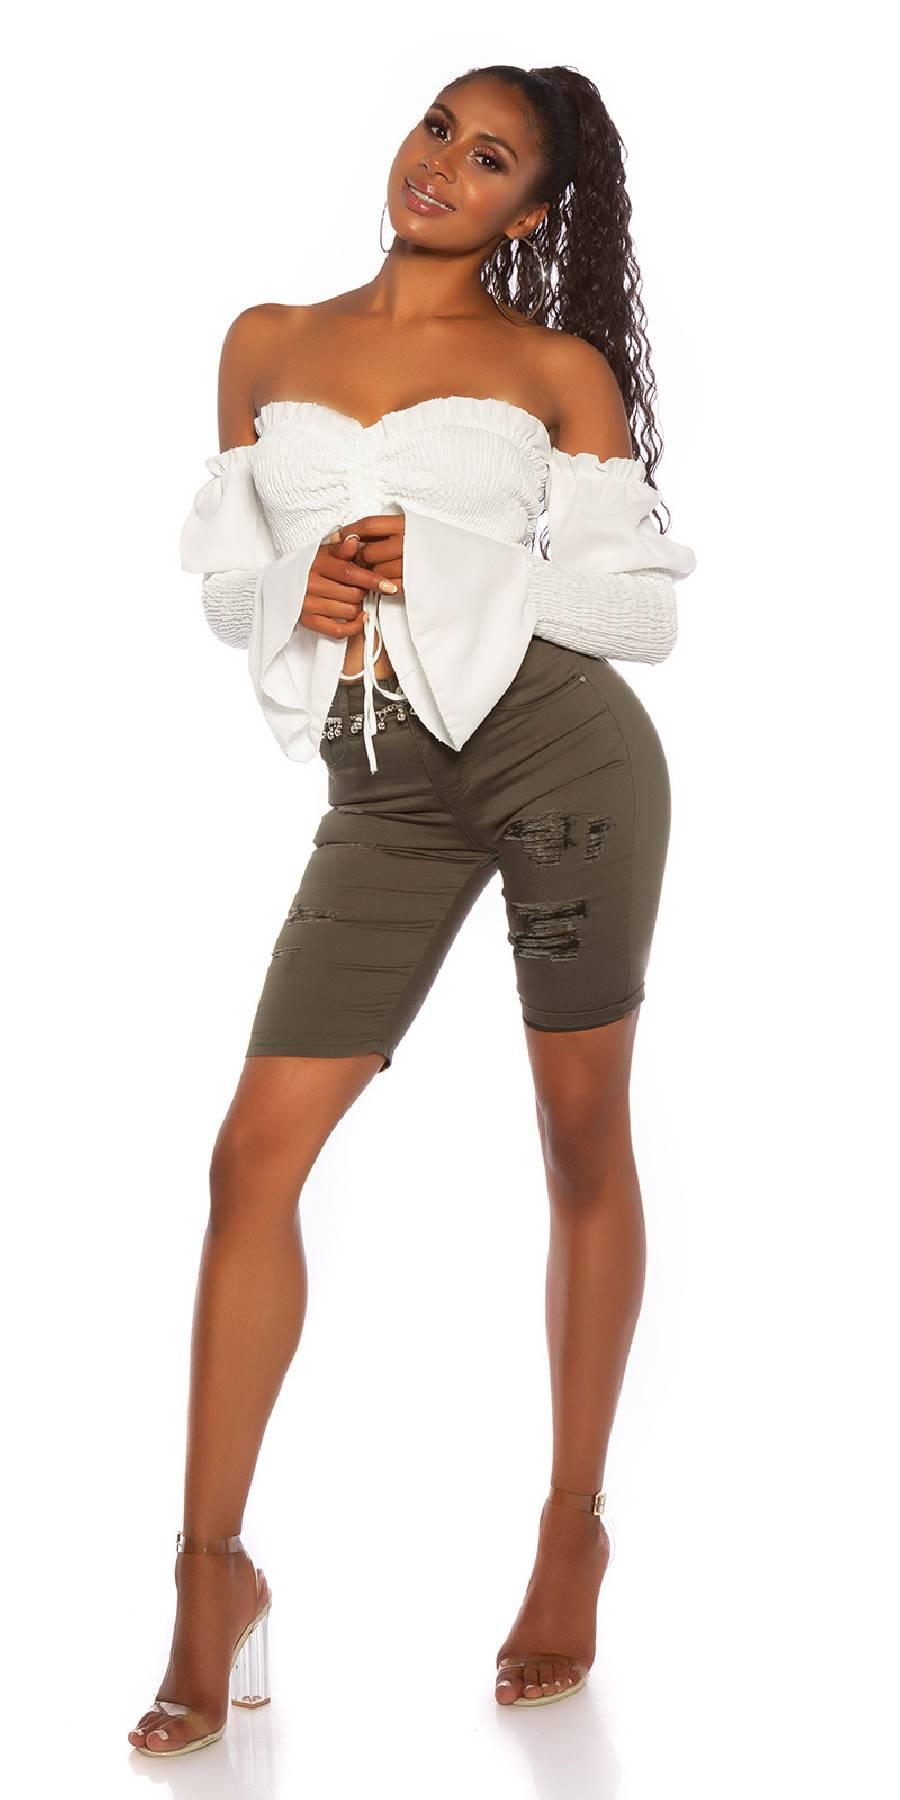 T shirt homme Tendance Fashion couleur caramel